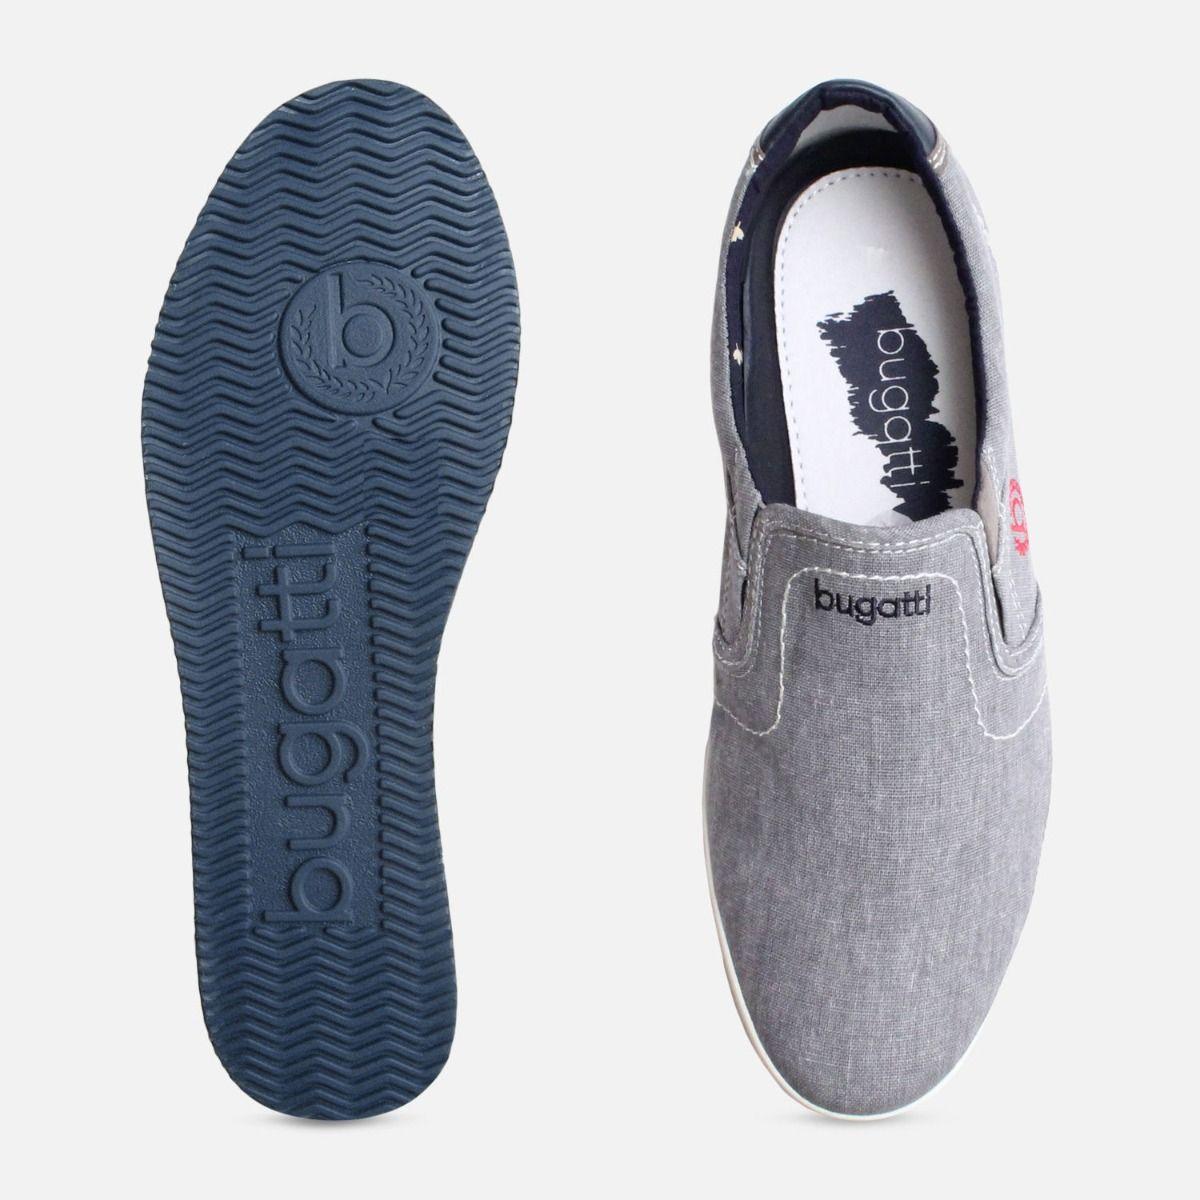 Exclusive Grey Canvas Plimsoll by Bugatti